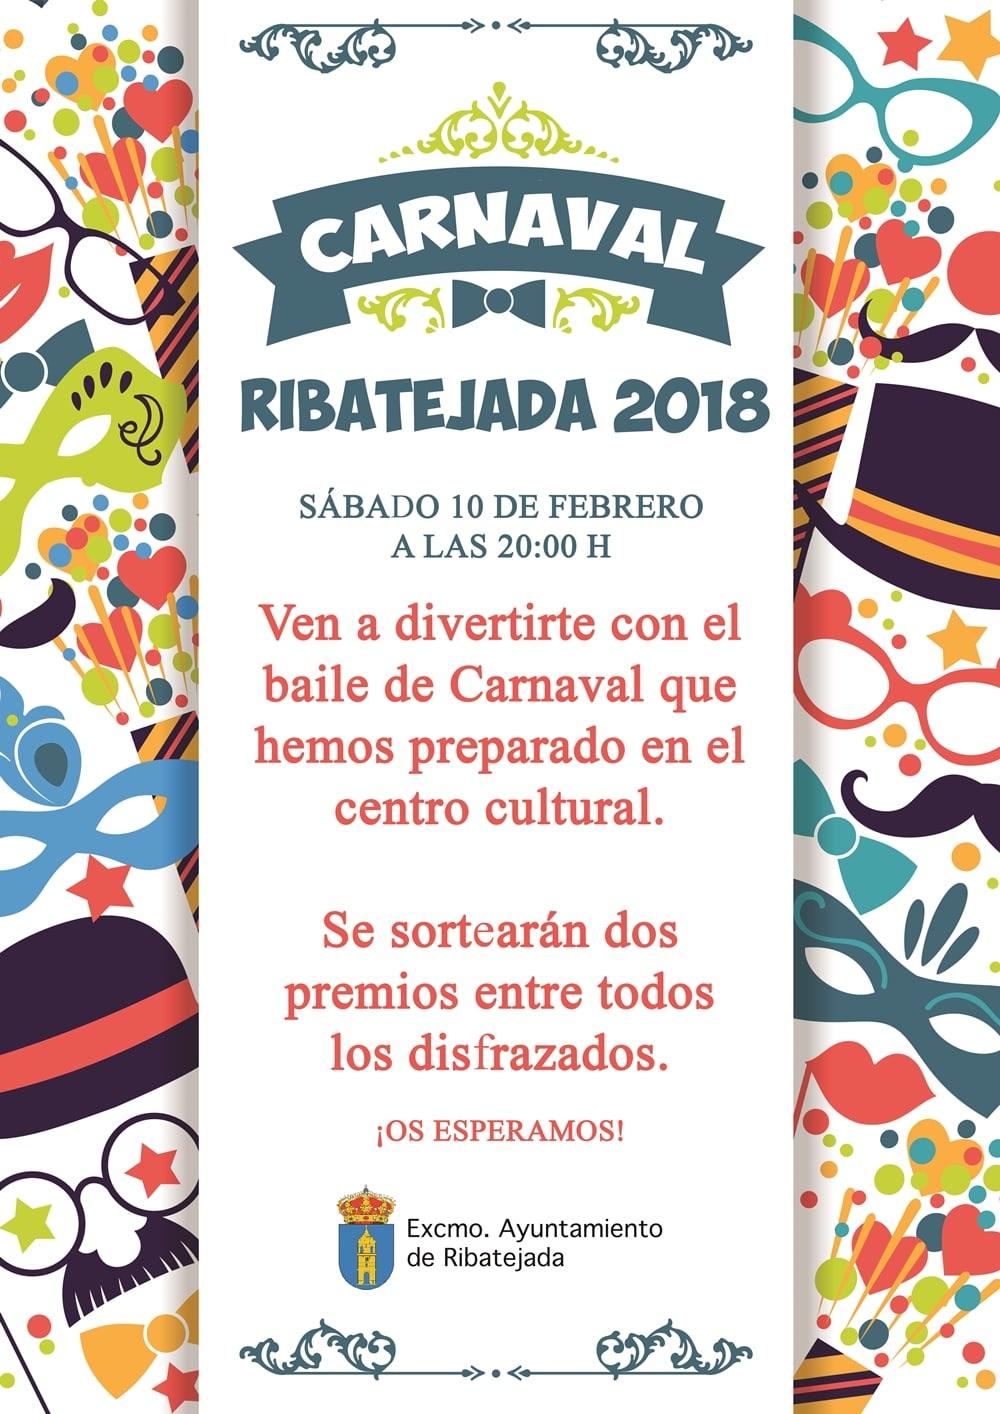 RIBATEJADA CARNAVALES 2018-min